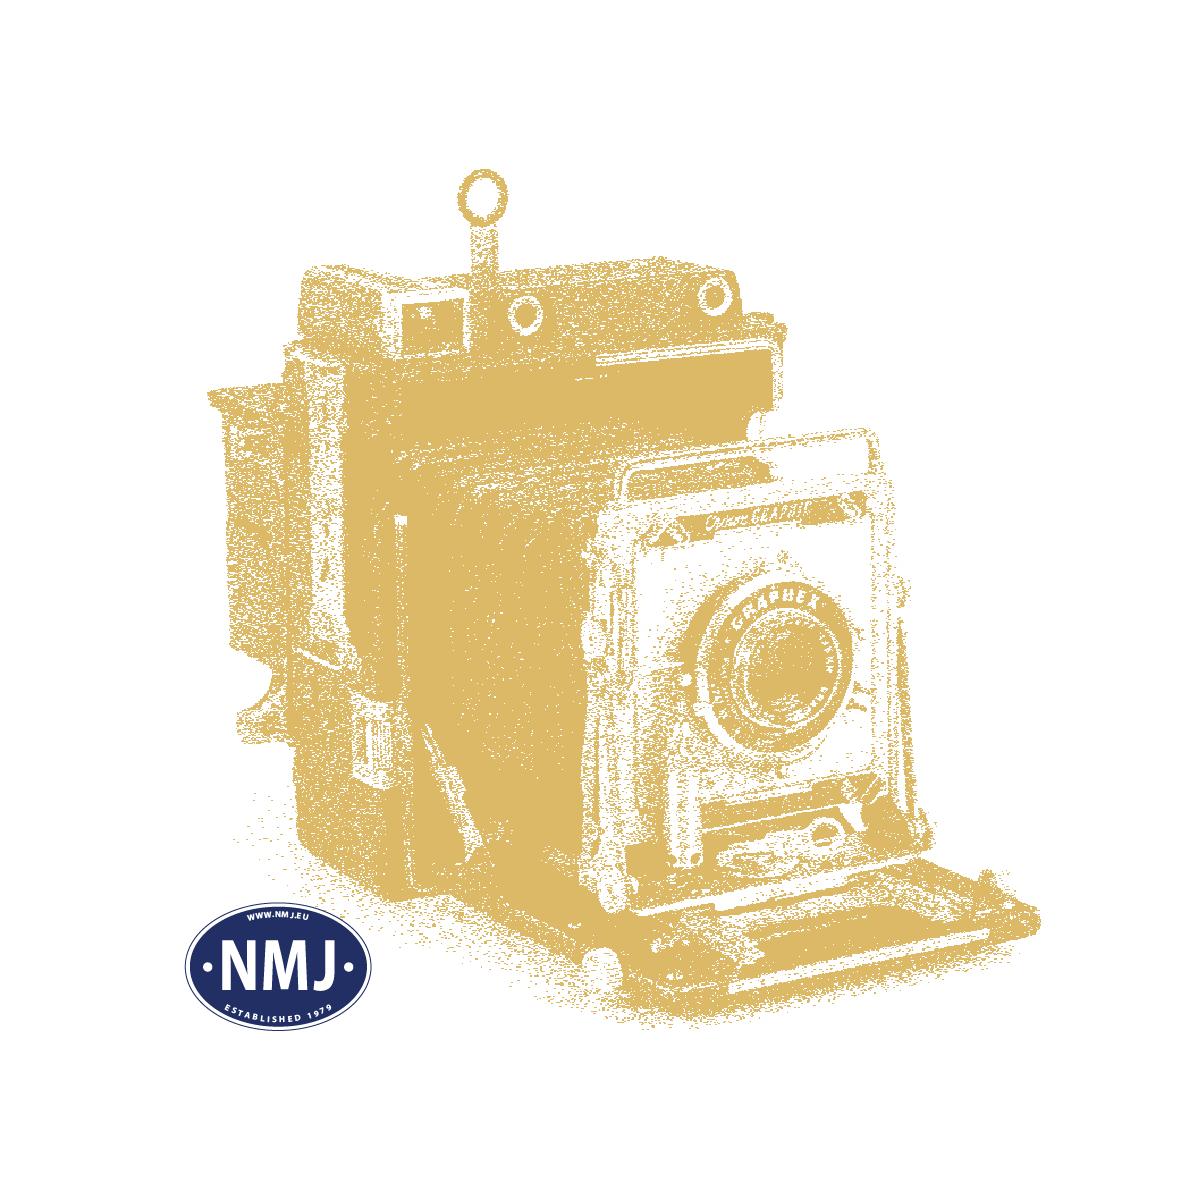 NMJB1120 - NSB Stromabnehmer